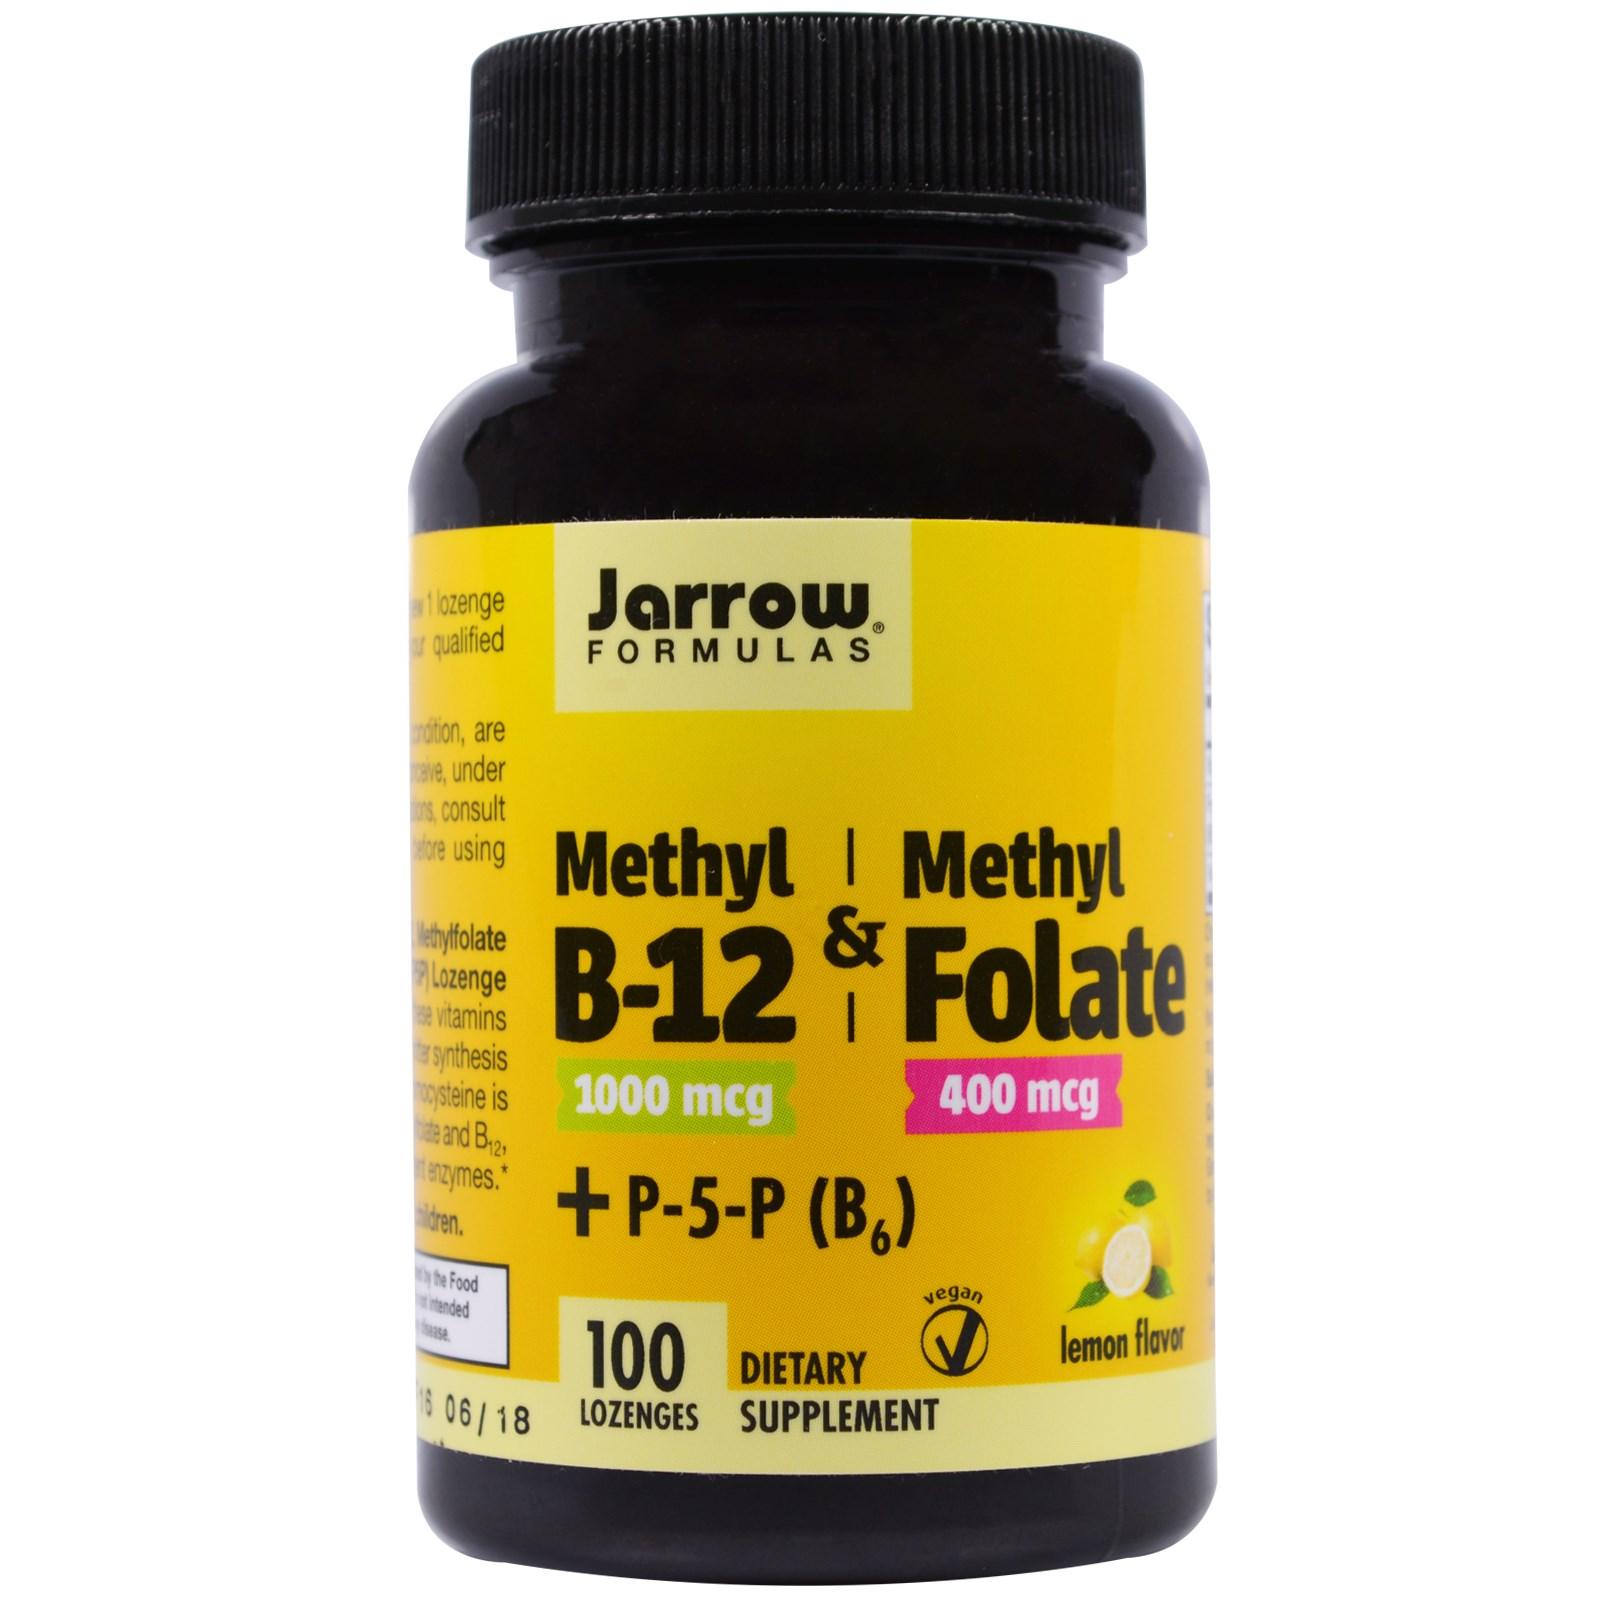 Image of Metil B-12 & metile folato sapore di limone 1000 mcg / 400 mcg (100 pastiglie) - Jarrow Formulas 0790011180180